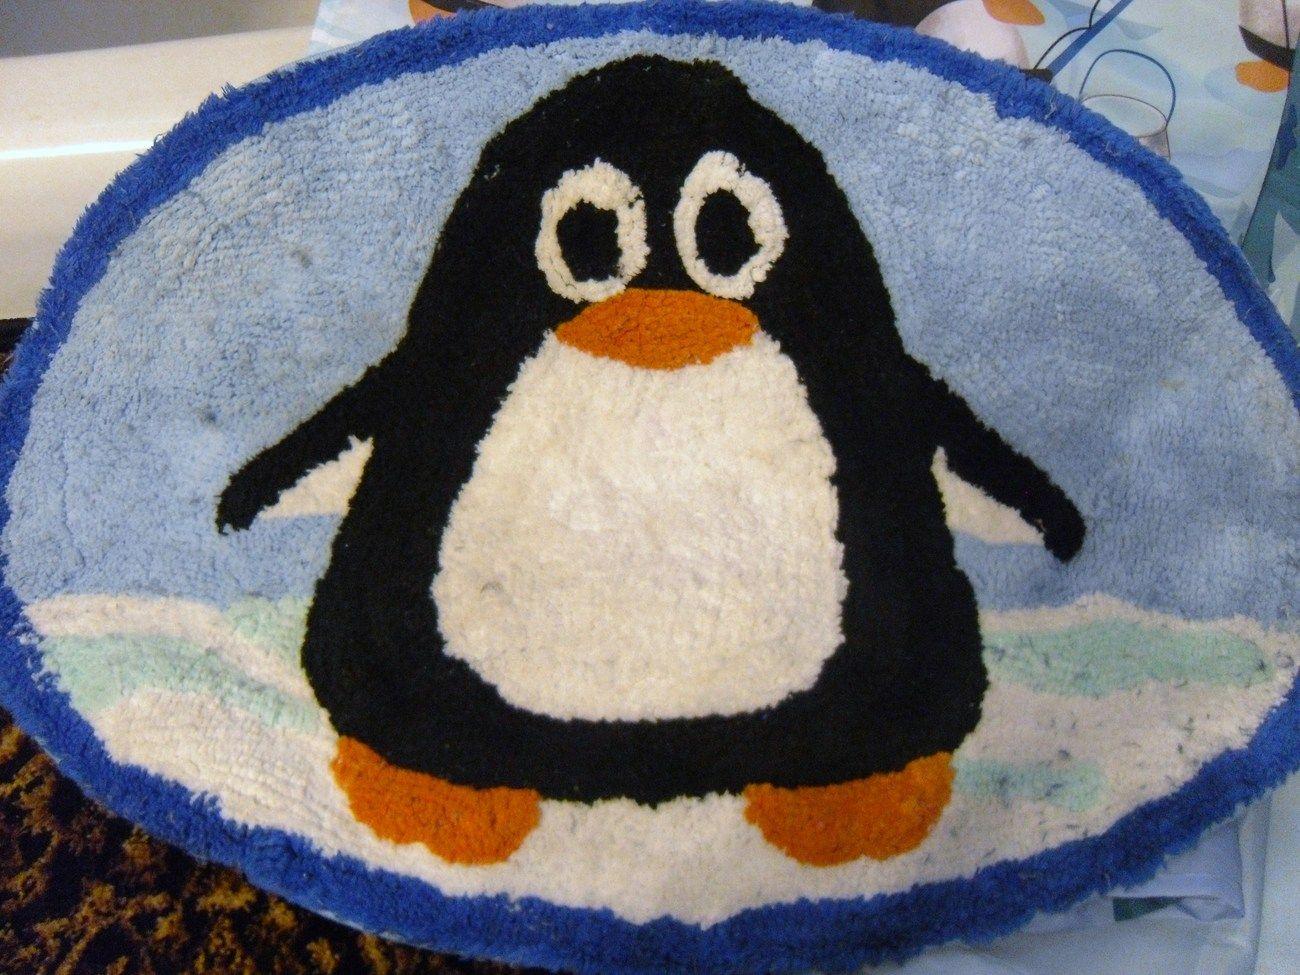 Penguin Shower Curtains Bath Set Rug Soap Dish Curtain